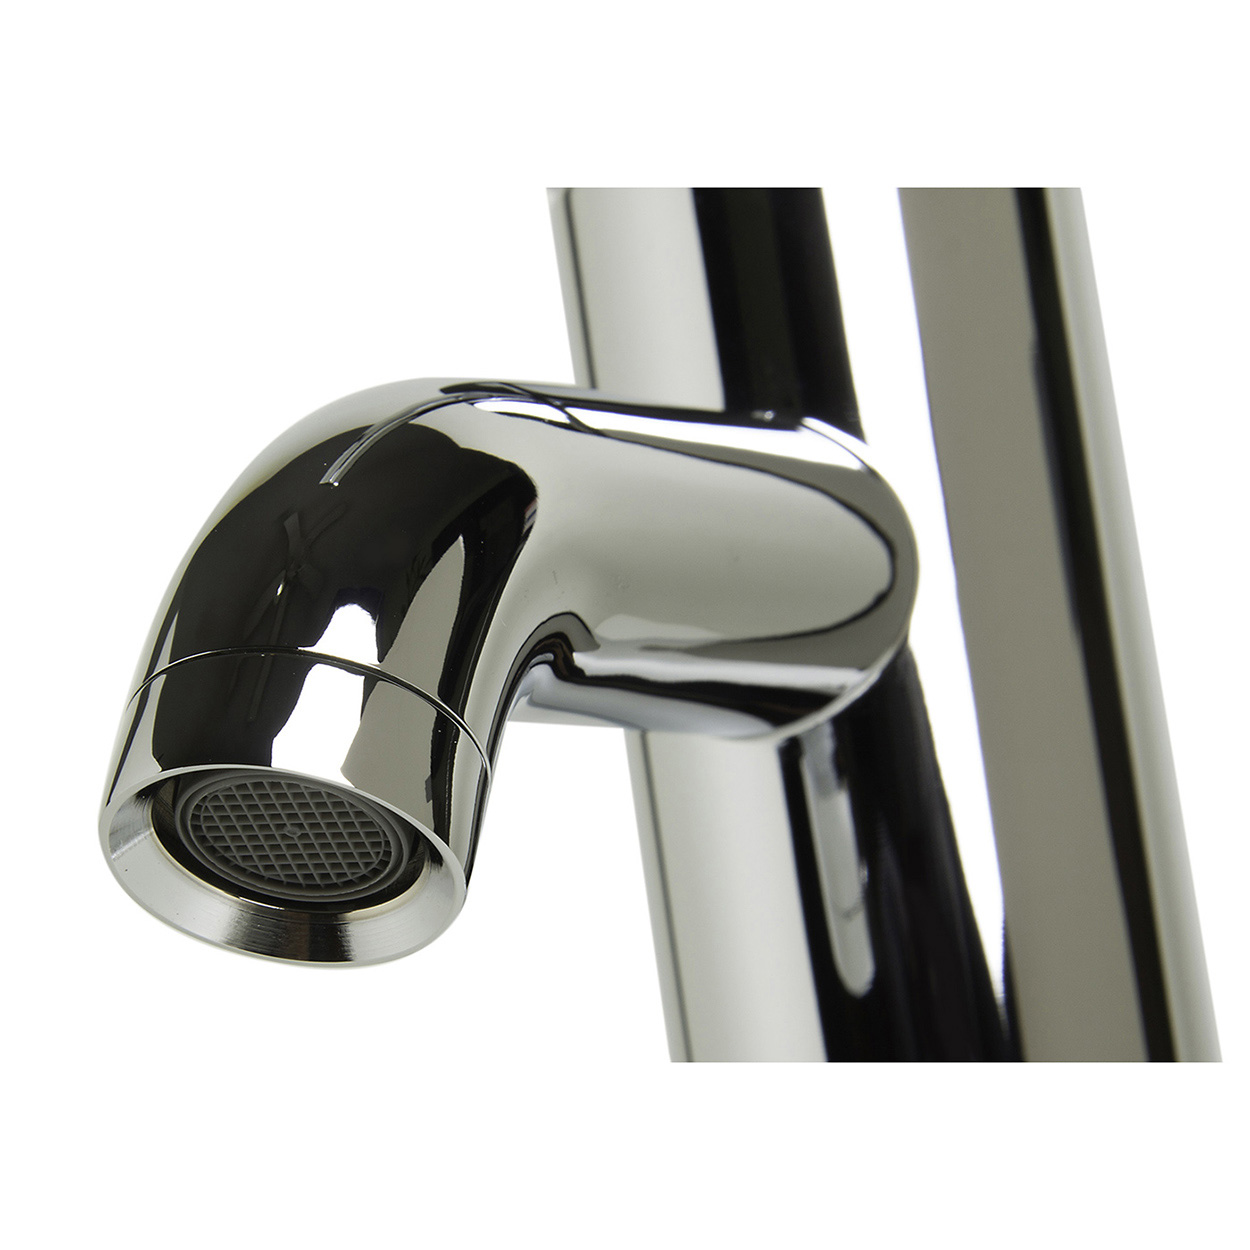 Bath4all Alfi Brand Ab1433 Polished Chrome Single Lever Bathroom Faucet